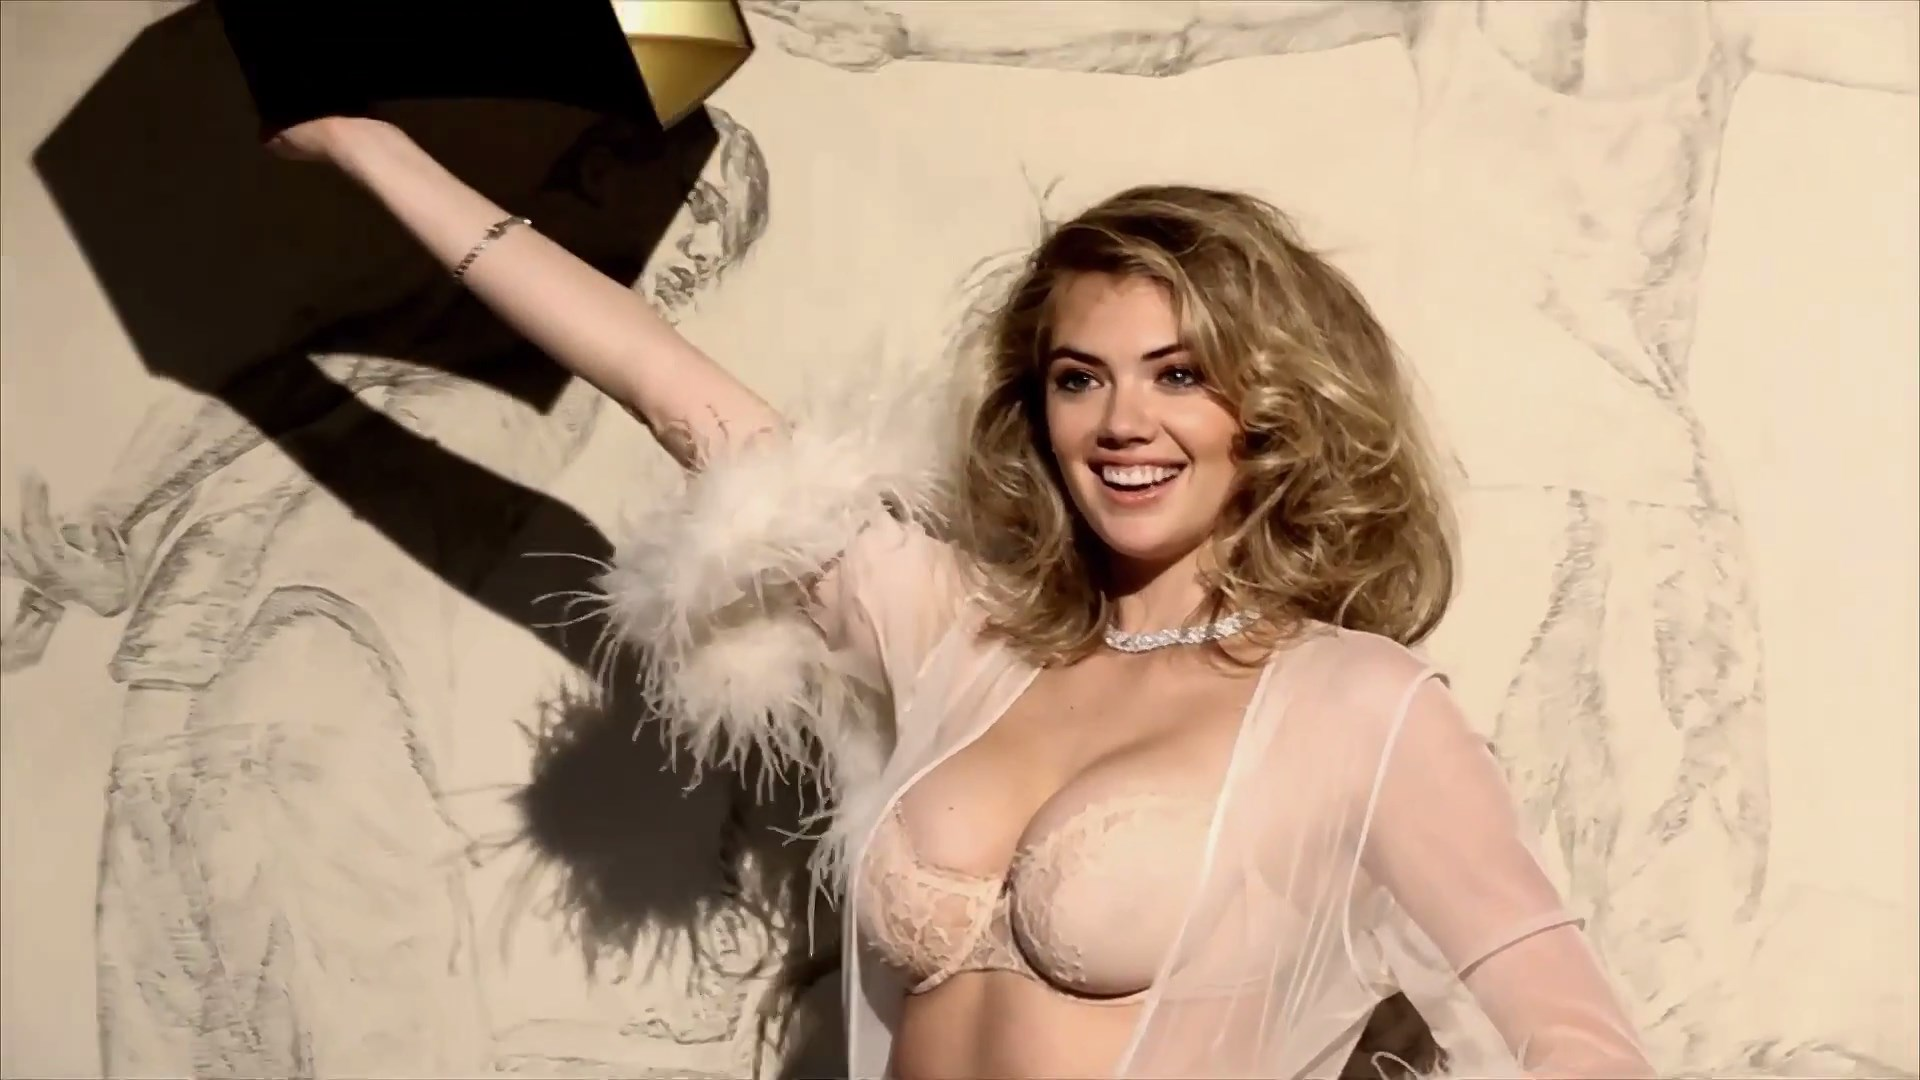 Kate Upton nipples exposed